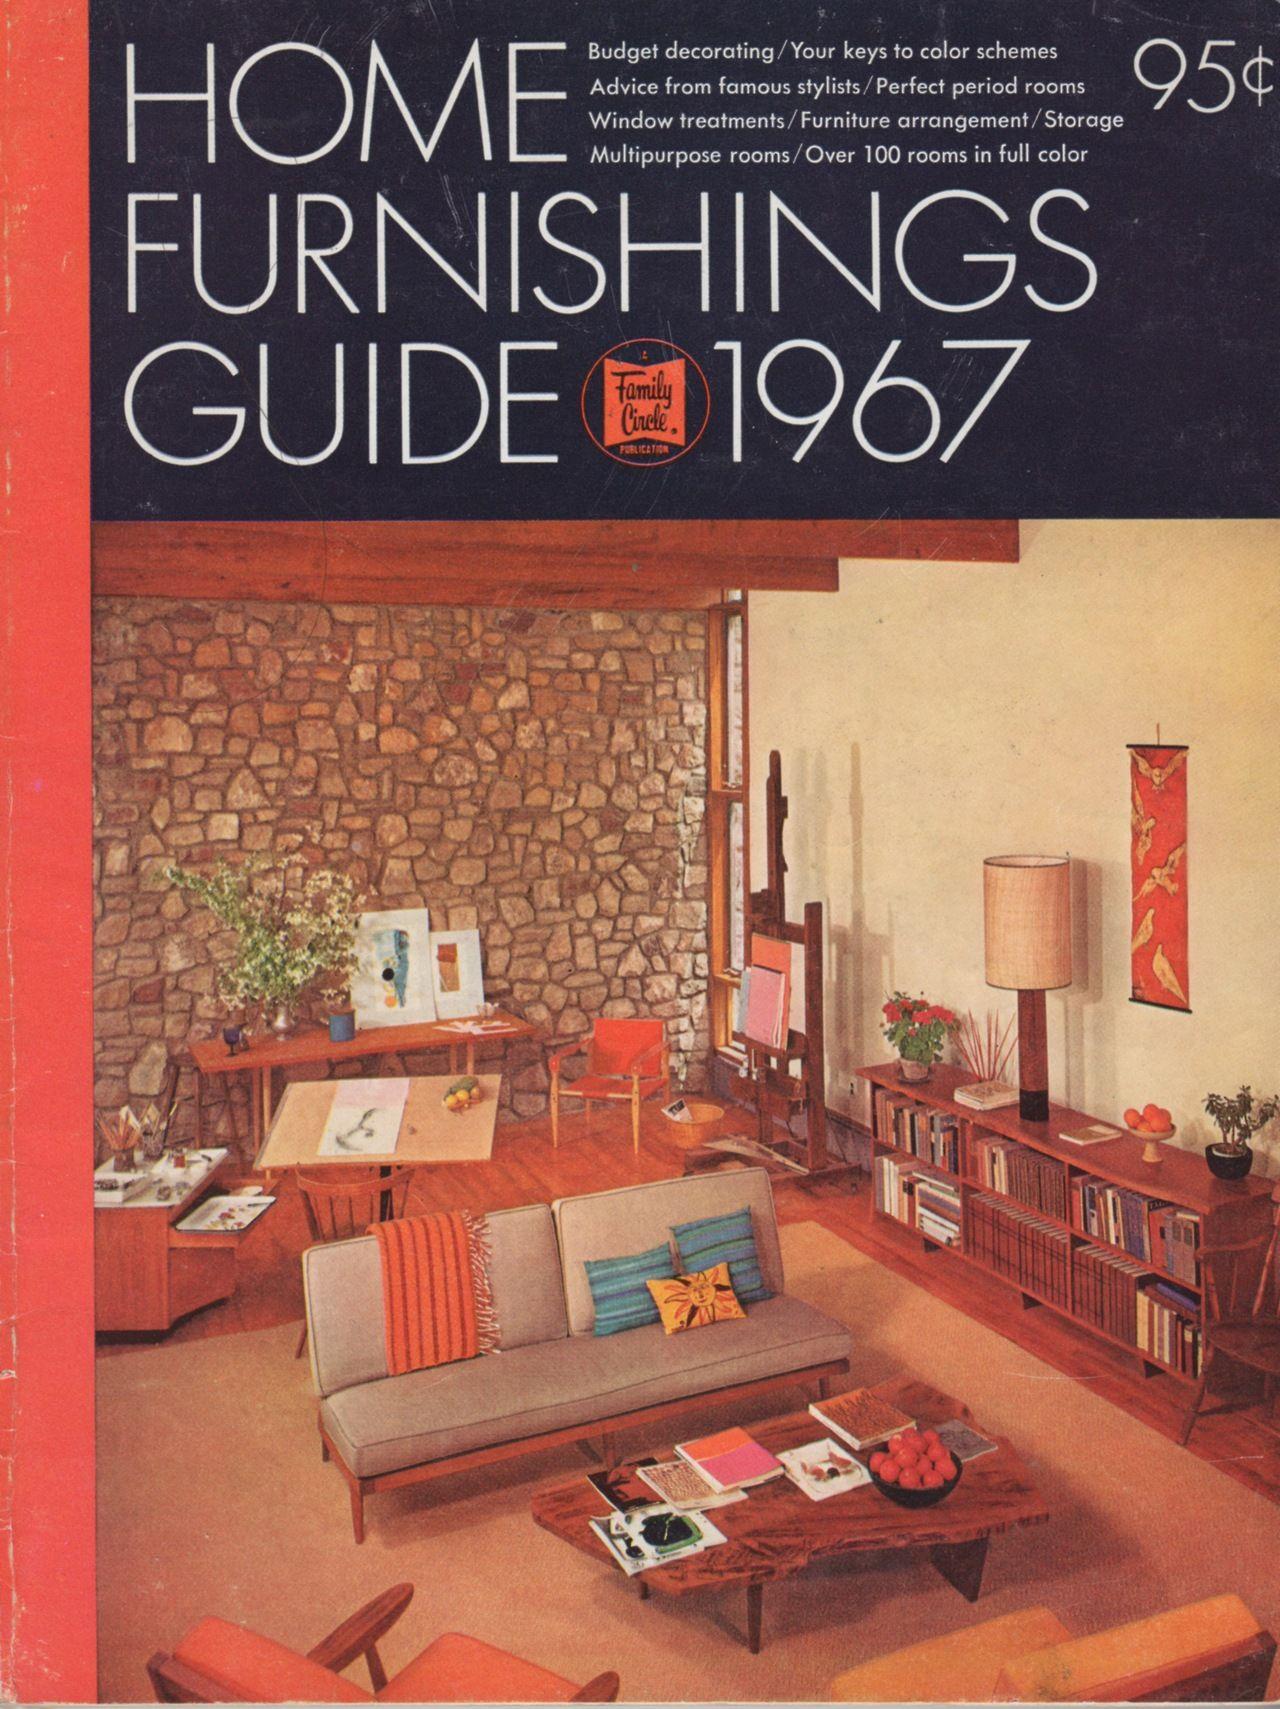 hippli books  9s decor, Mcm decor, Vintage interior design